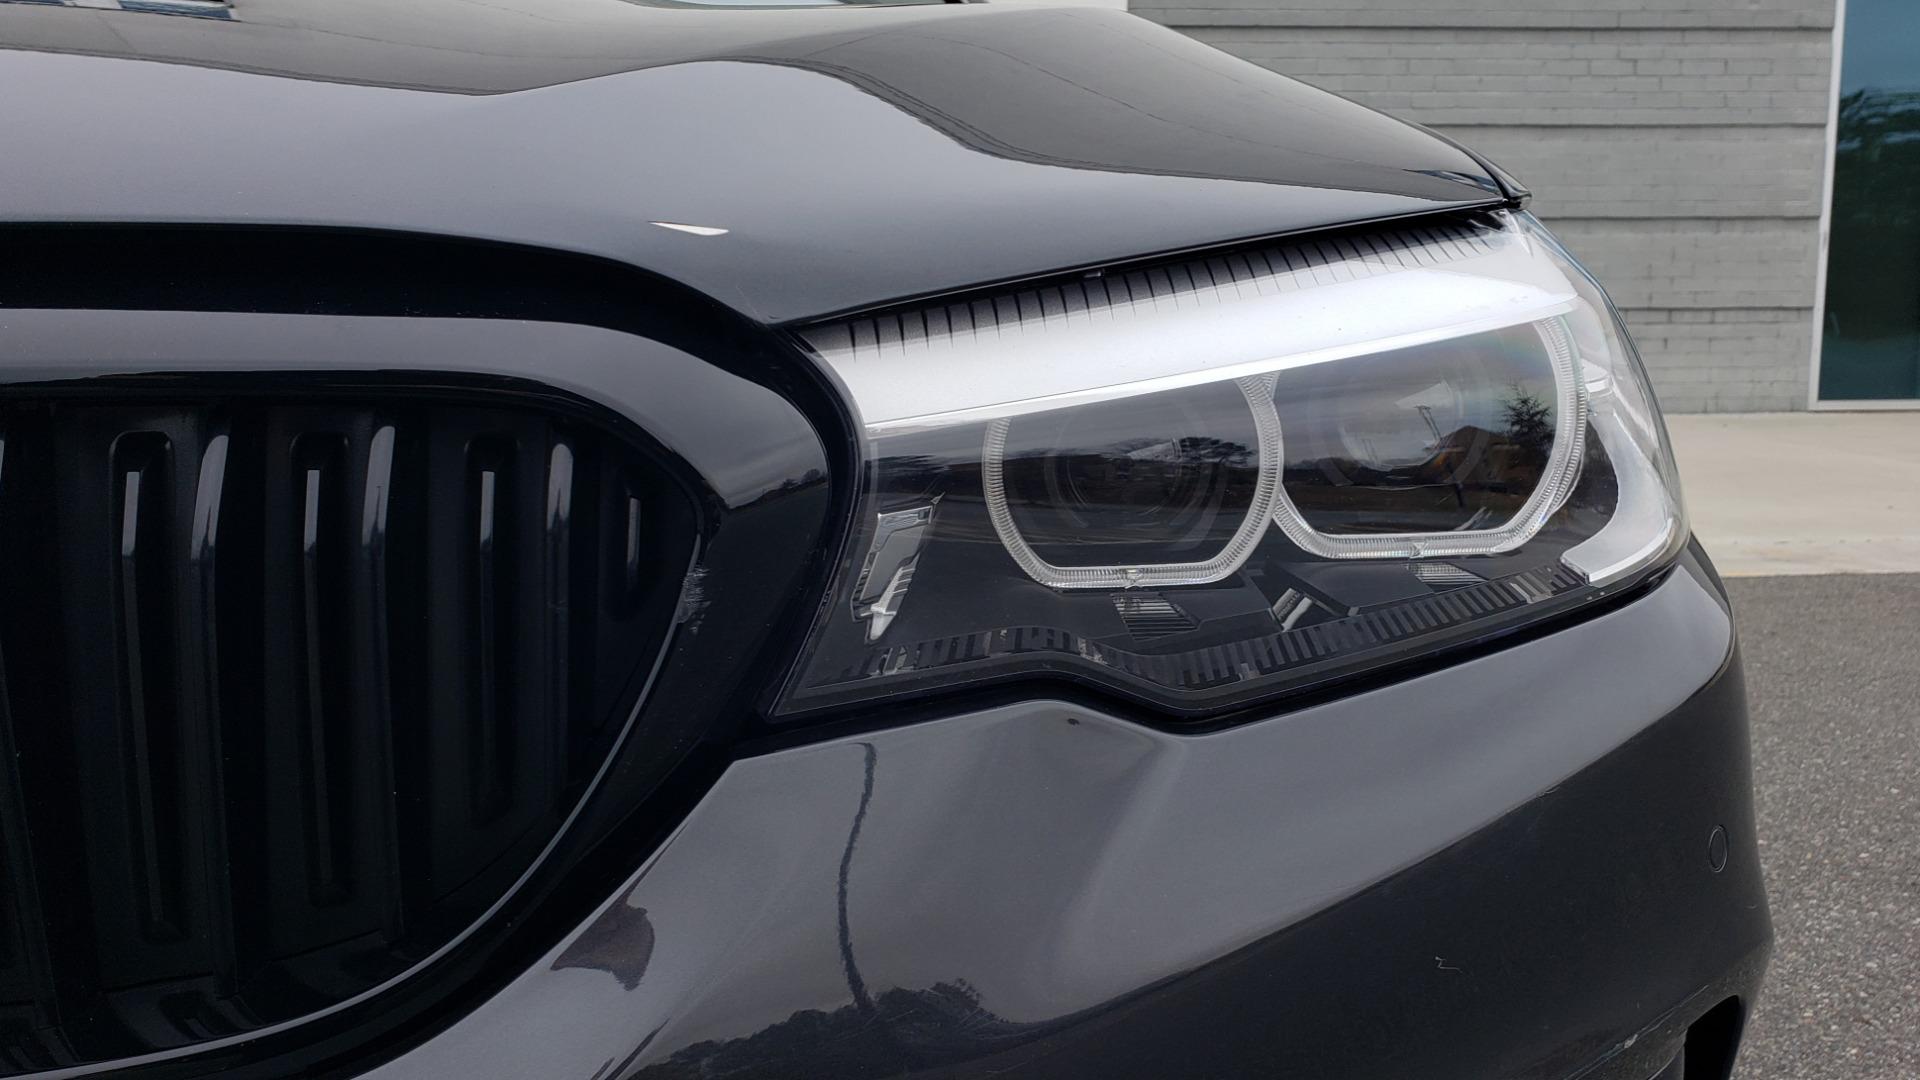 Used 2017 BMW 5 SERIES 530IXDRIVE / PREM PKG / DRVR ASST PLUS / CLD WTHR / APPLE CARPLAY for sale Sold at Formula Imports in Charlotte NC 28227 21